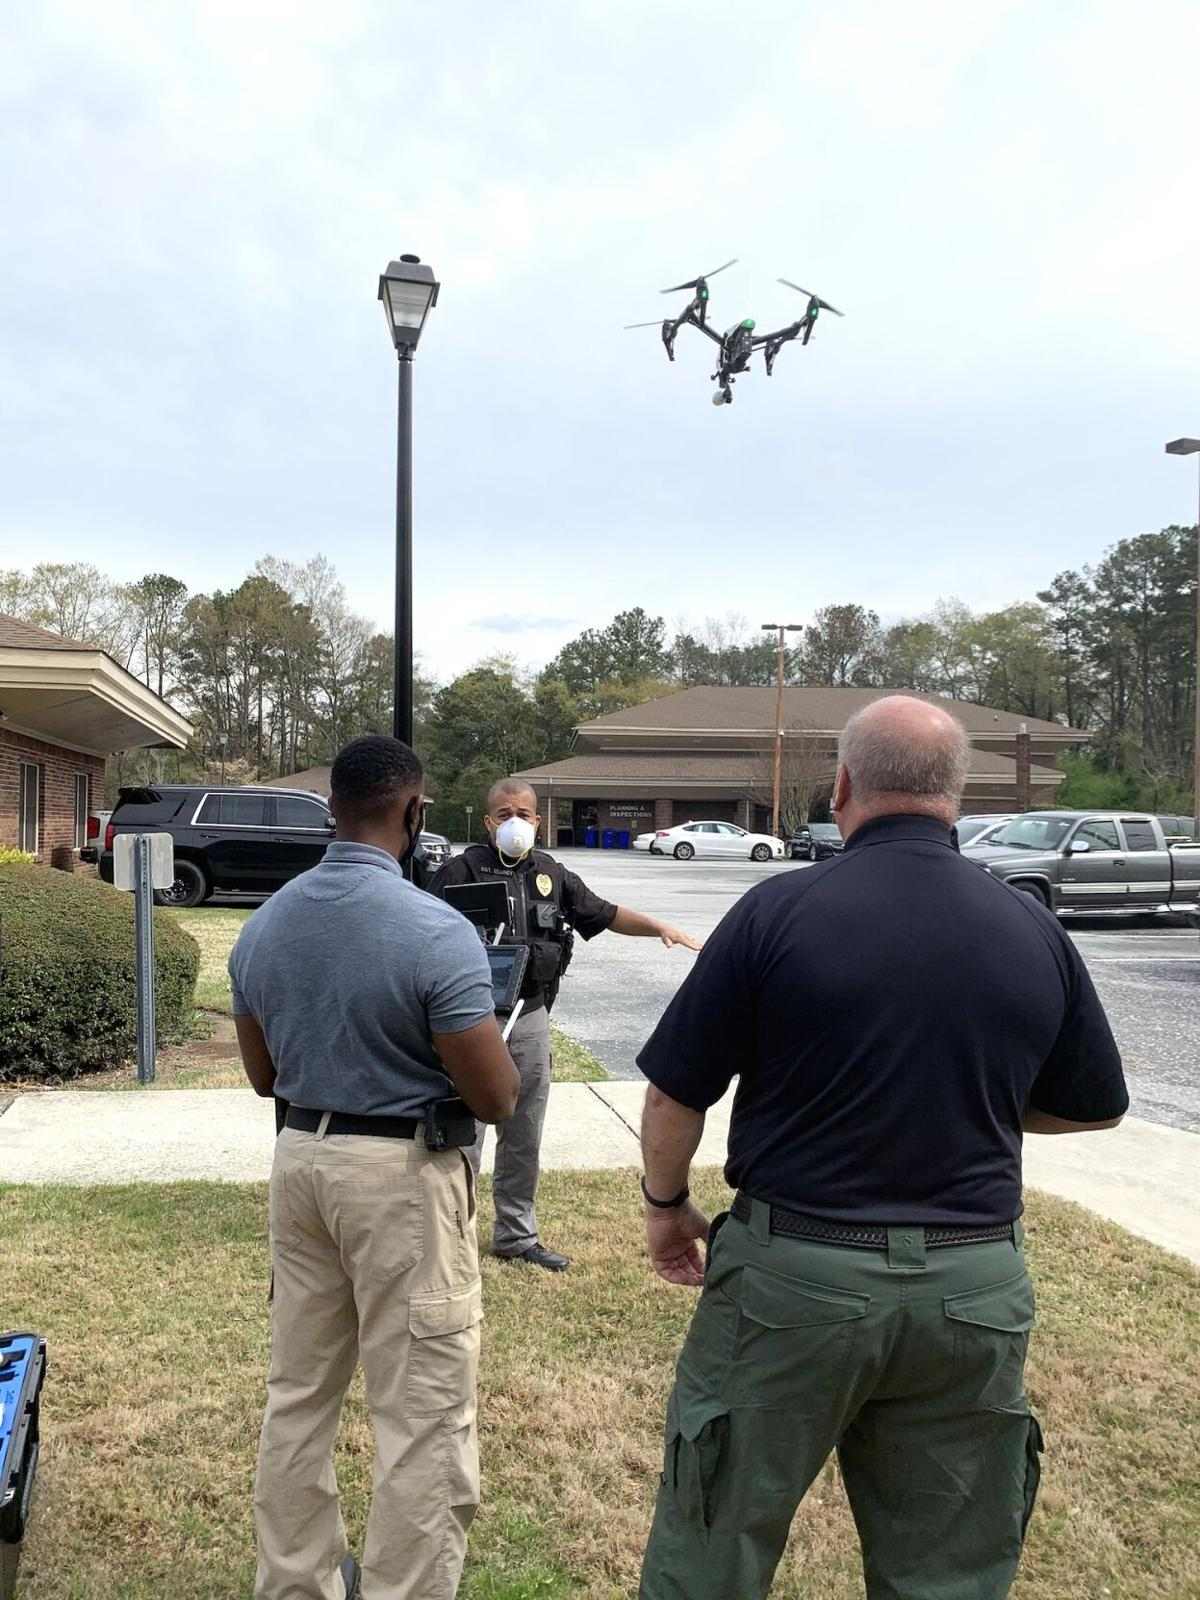 Conyers Code Enforcement_drone training Oct. 2021.JPG